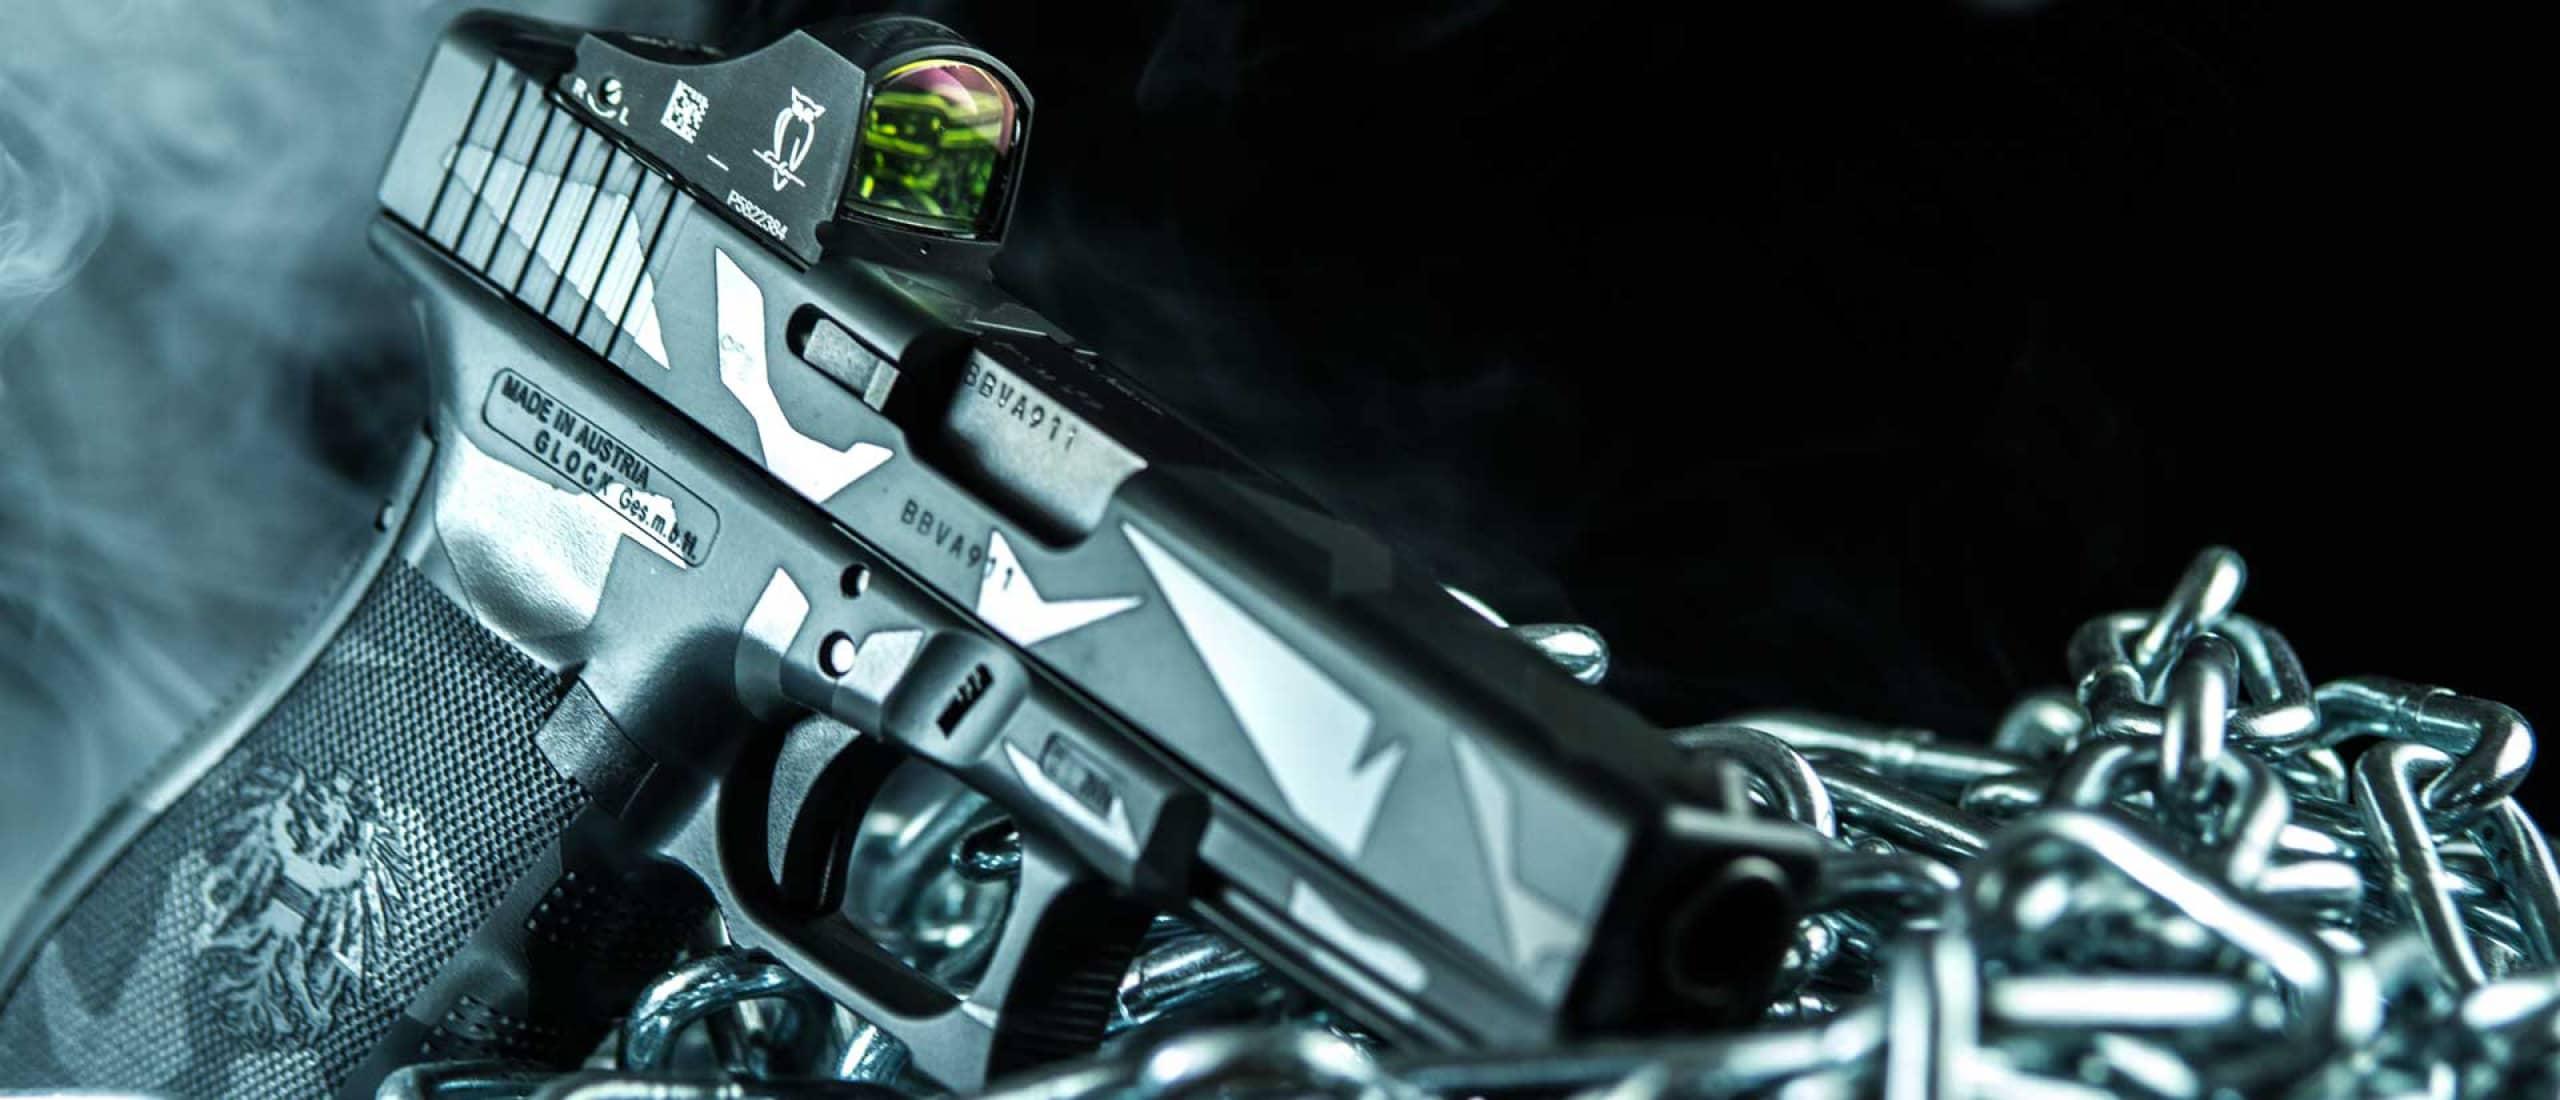 verex-tactical-tuning-waffen-pistole-glock-sig-sauer-17-cz-walther-visier-bruenieren-ar15-red-dot-beschichtung-tuning-cerakote-stippling-griptech-salzburg-slider-03